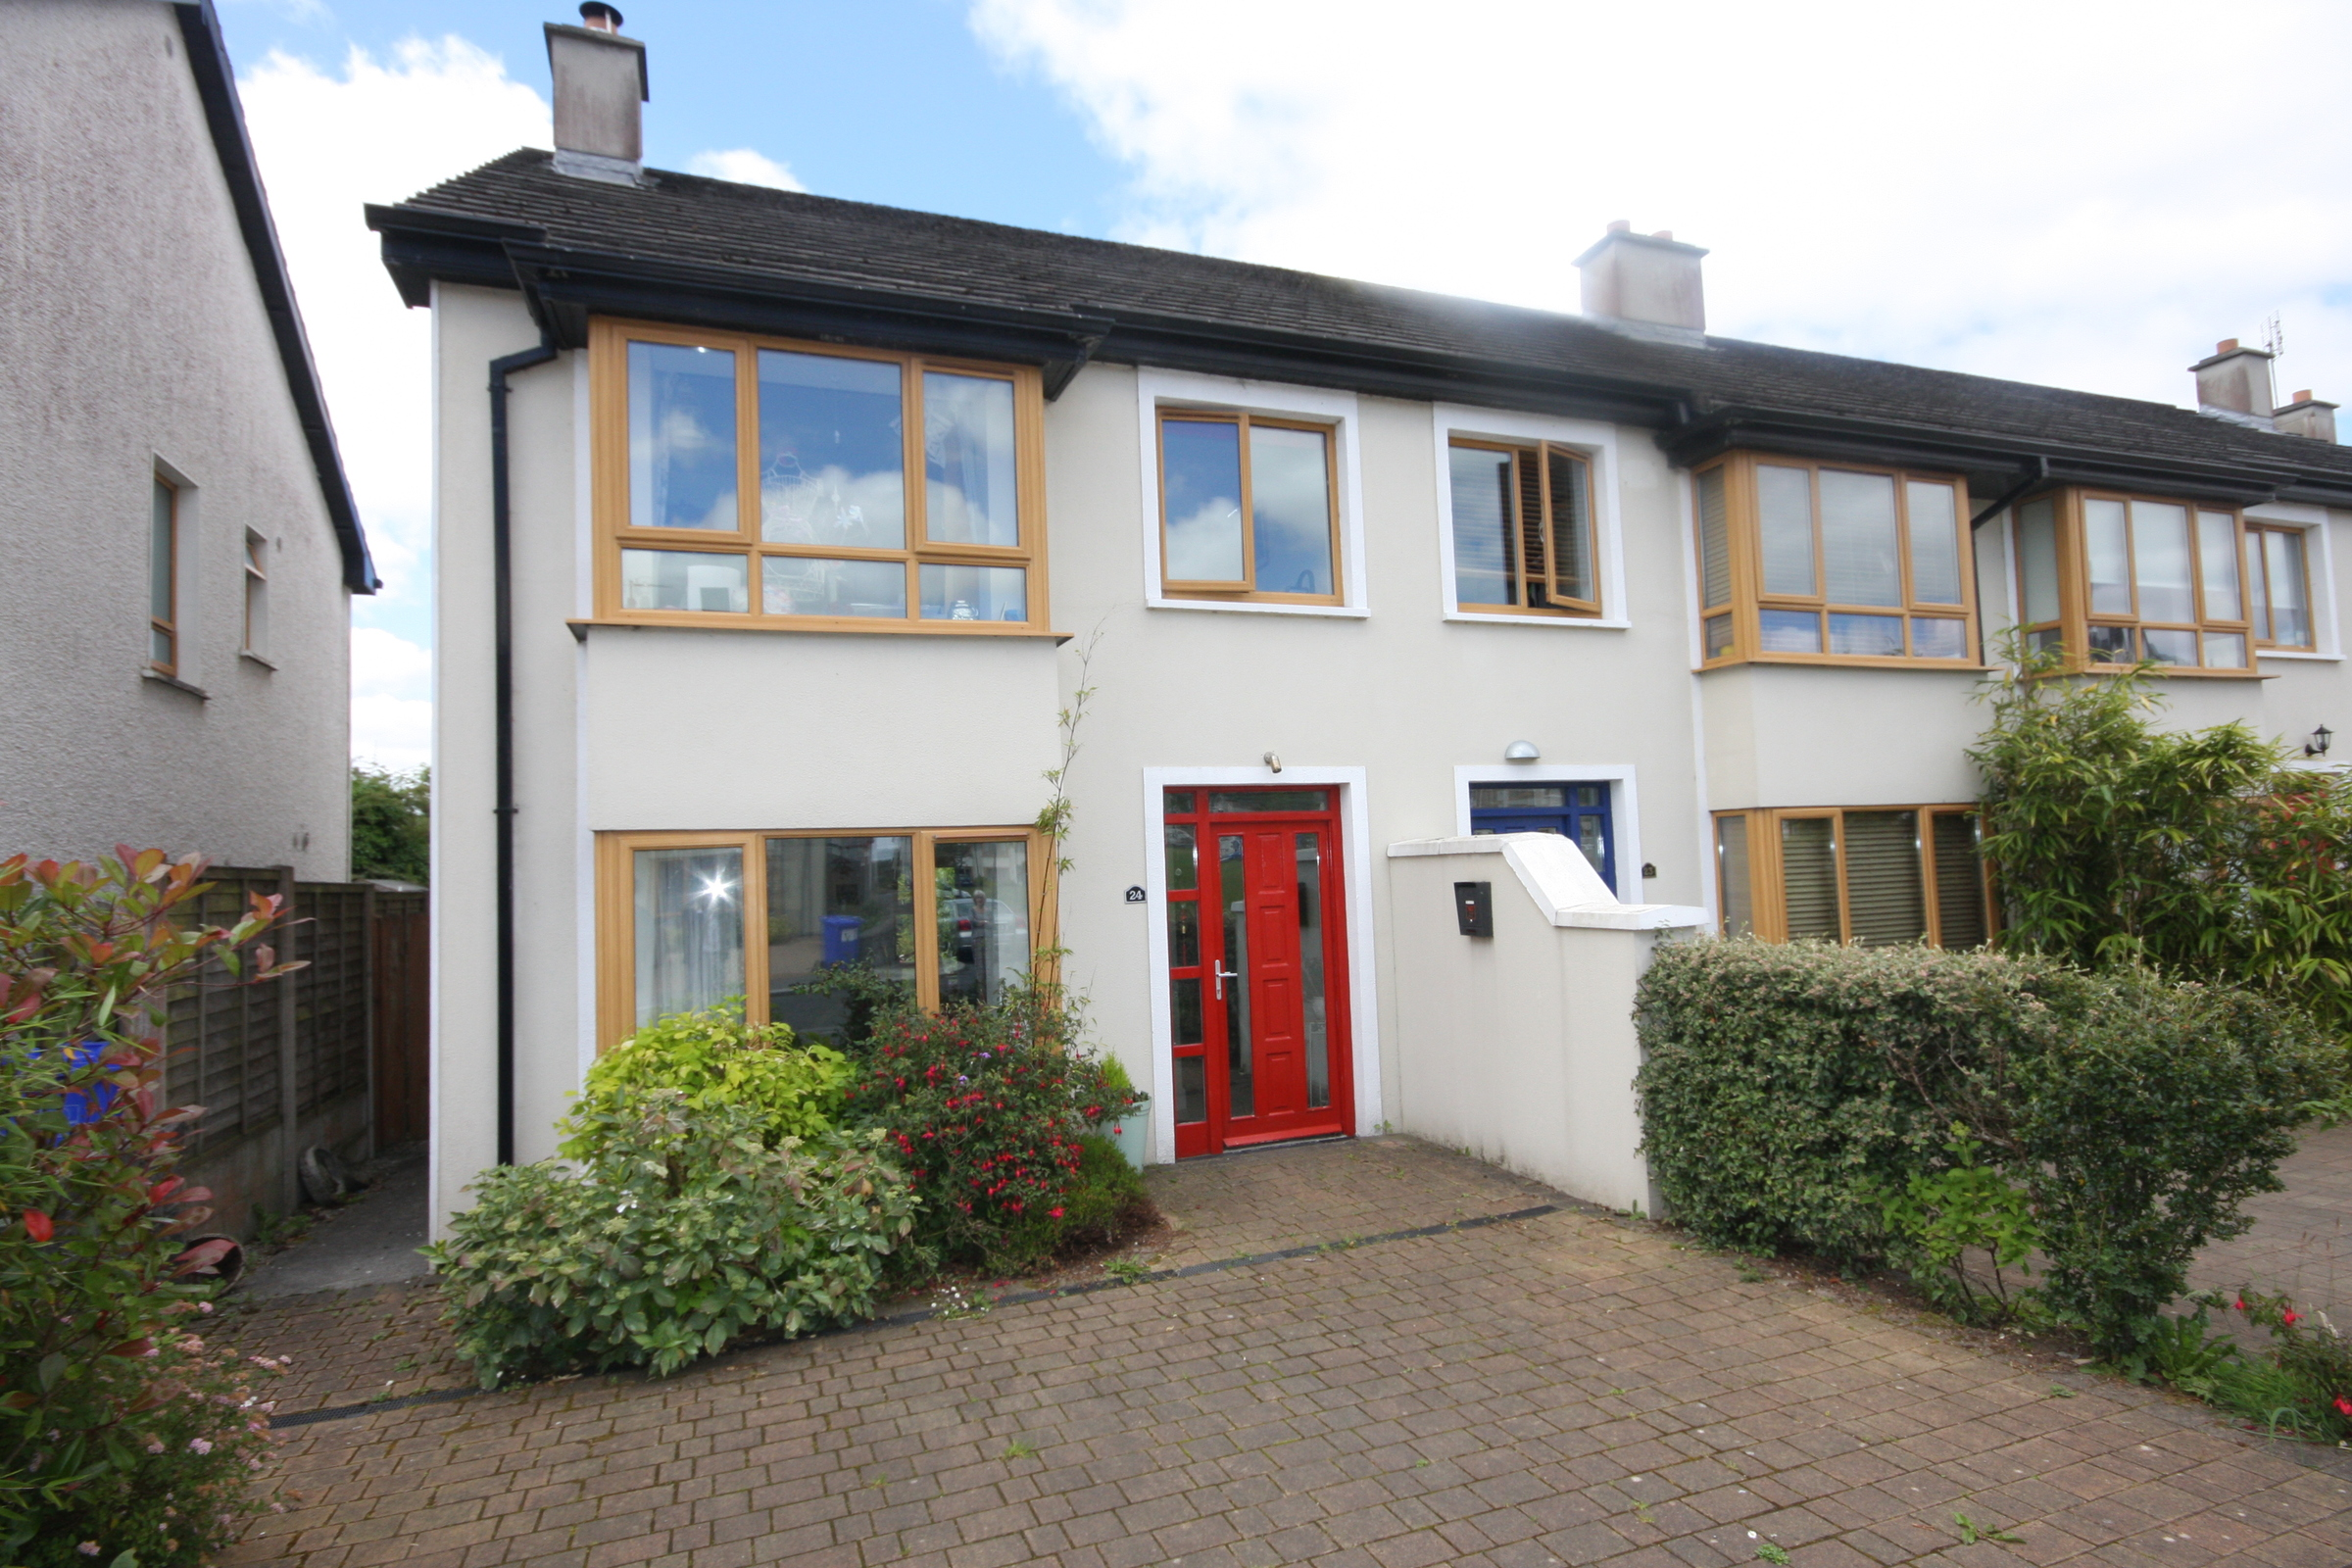 24 Carrabeag, Newport Road, Castlebar, Co. Mayo